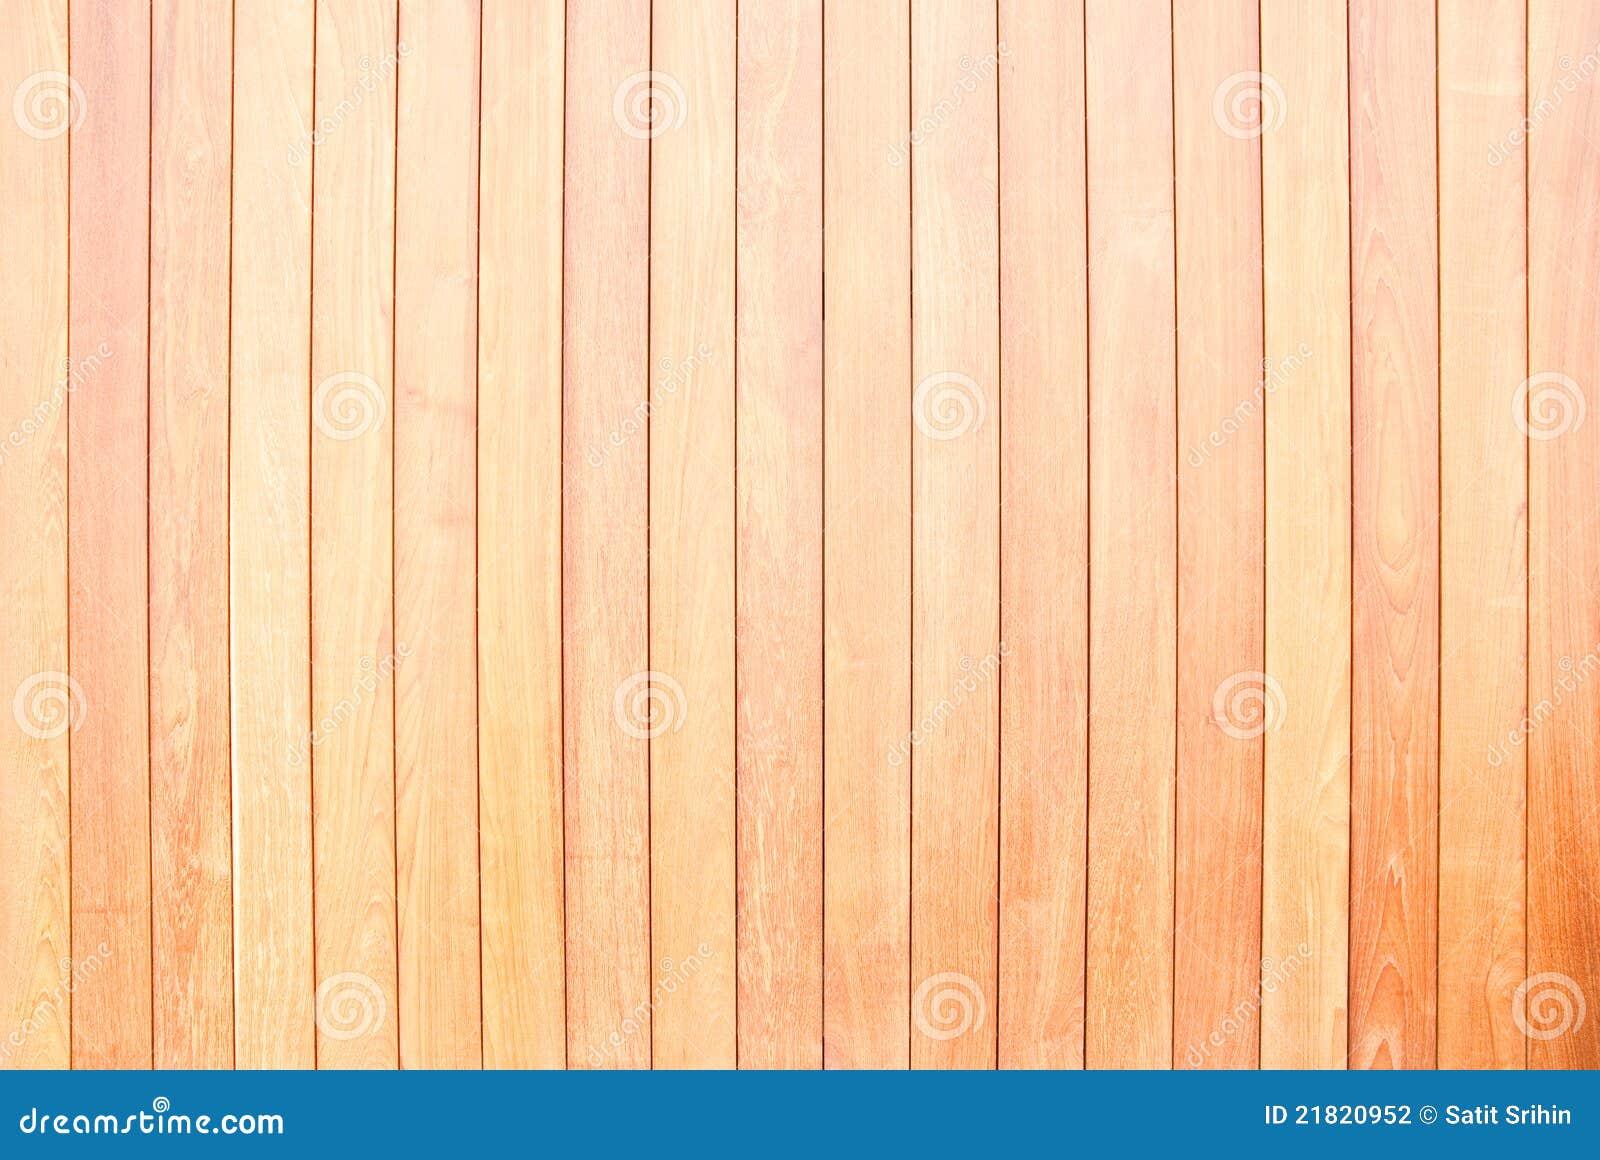 Panel Of Wood Plank Stock Photography Image 21820952